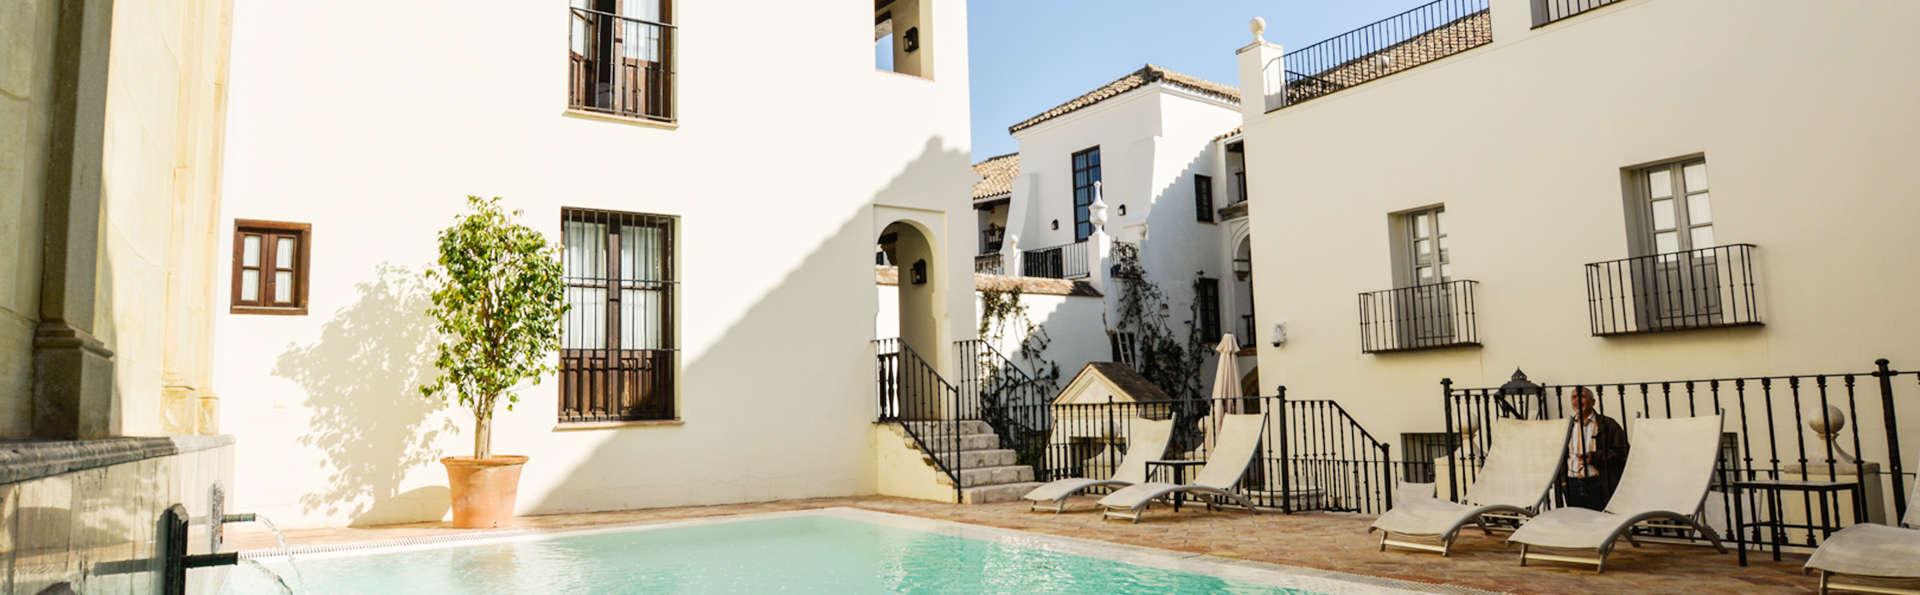 Hotel las casas de la juder a de c rdoba 4 c rdoba espa a for Hotel casa de los azulejos cordoba espana